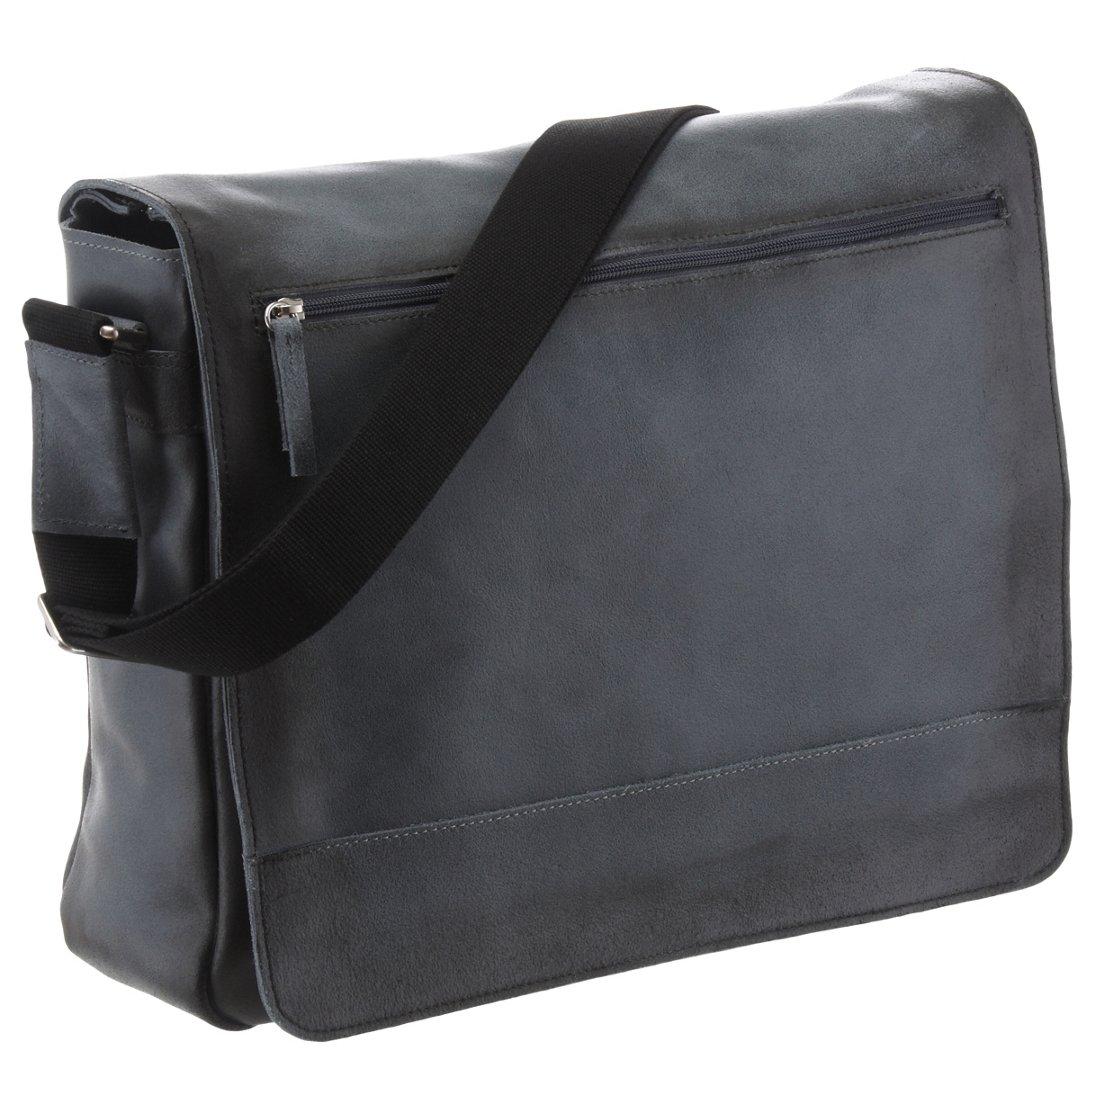 6ea13ad9d56 Jost Narvik Umhängetasche mit Laptopfach 38 cm - koffer-direkt.de